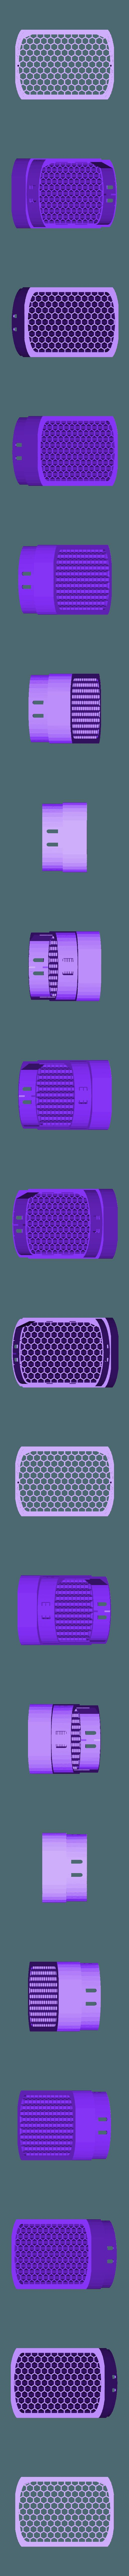 filled version.stl Télécharger fichier STL YN968EX-RT grille en nid d'abeille flash • Modèle imprimable en 3D, v1k0asd19900627